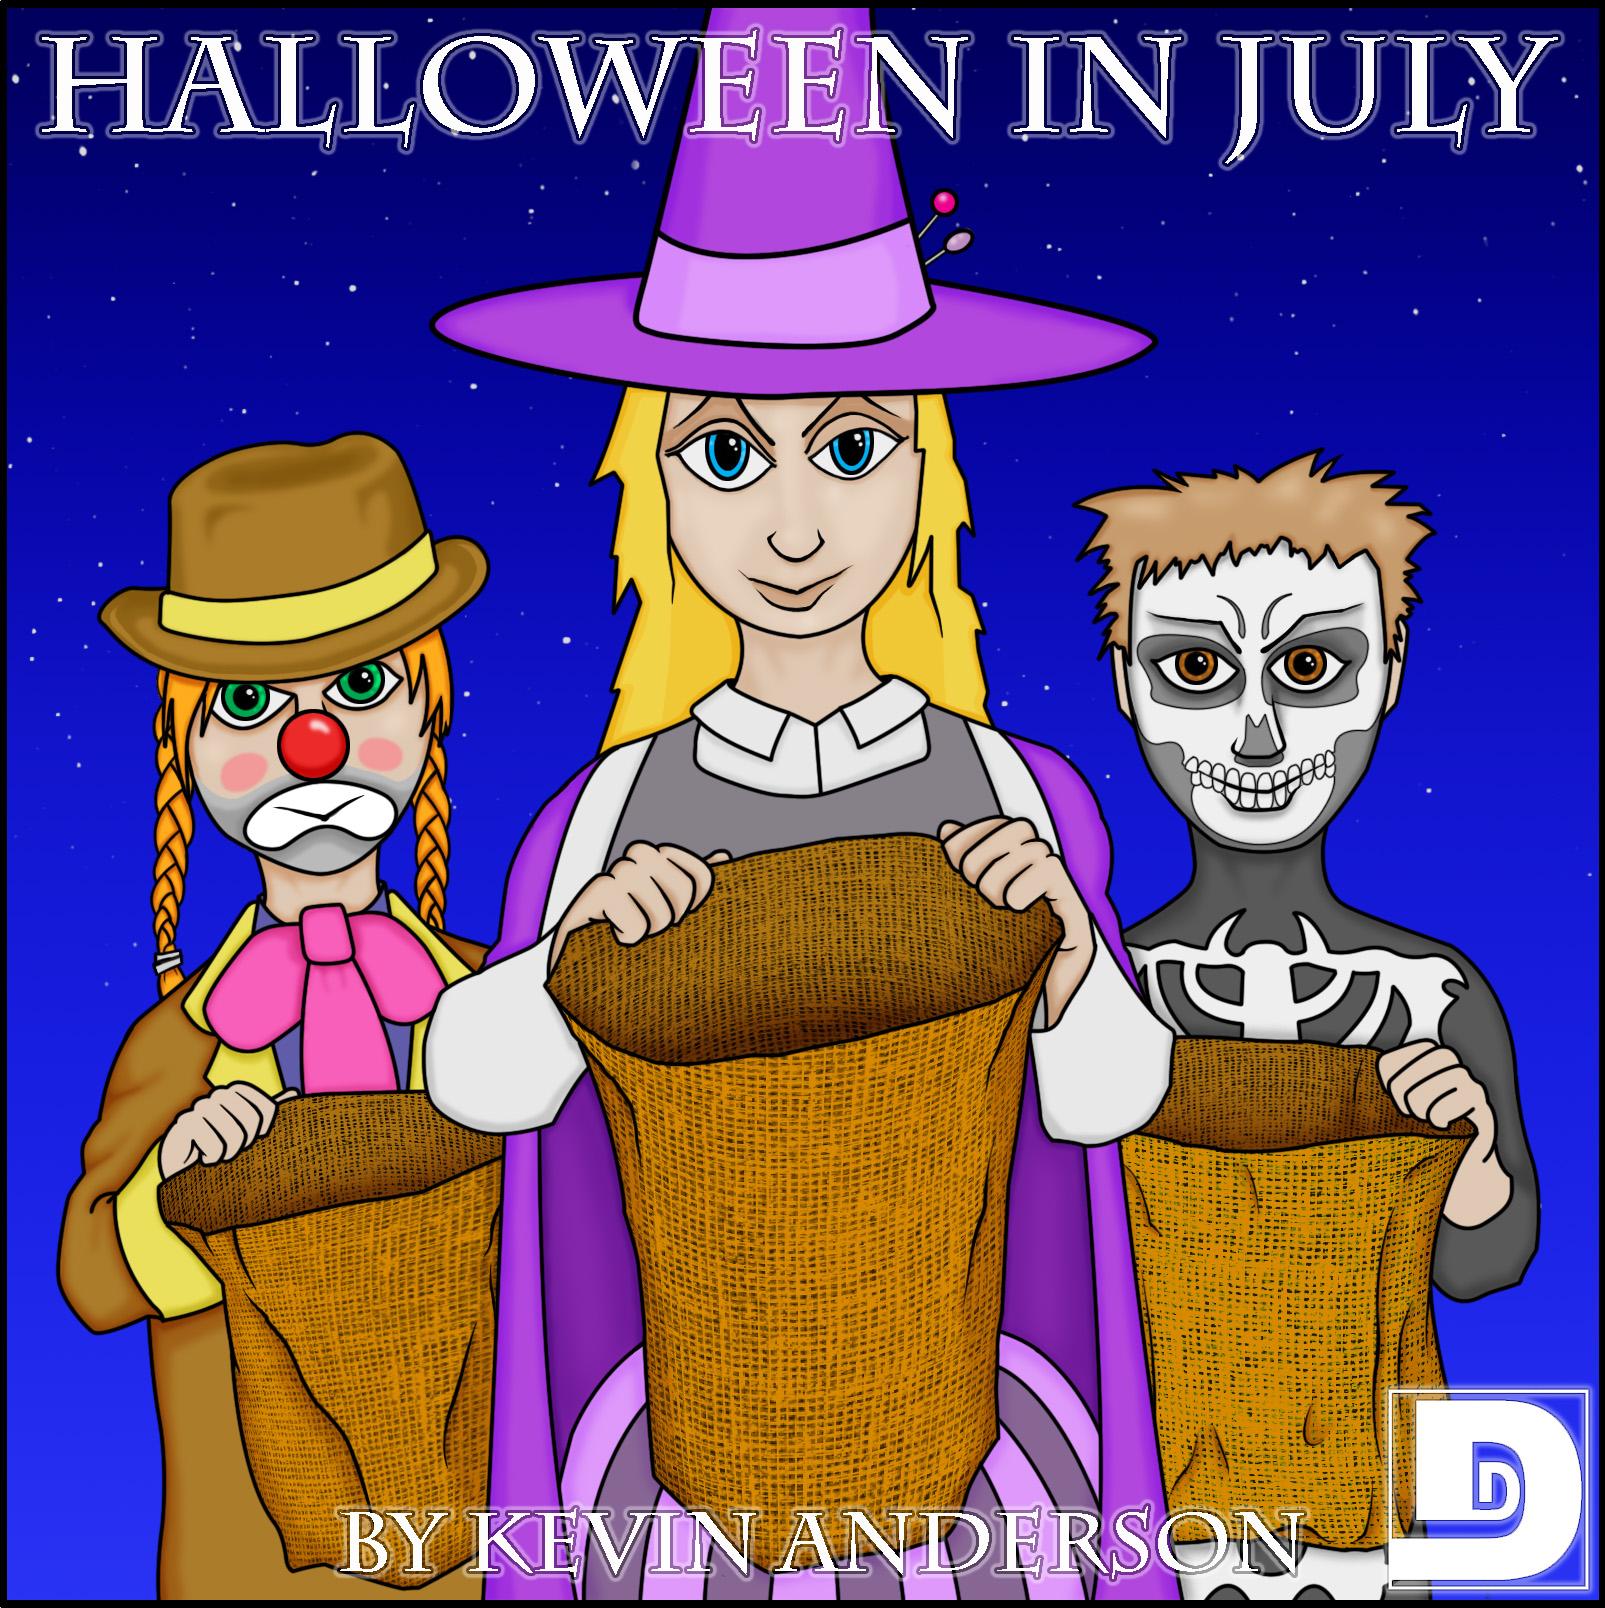 episode 27 osse halloween in july by kevin anderson - Halloween Wav Files